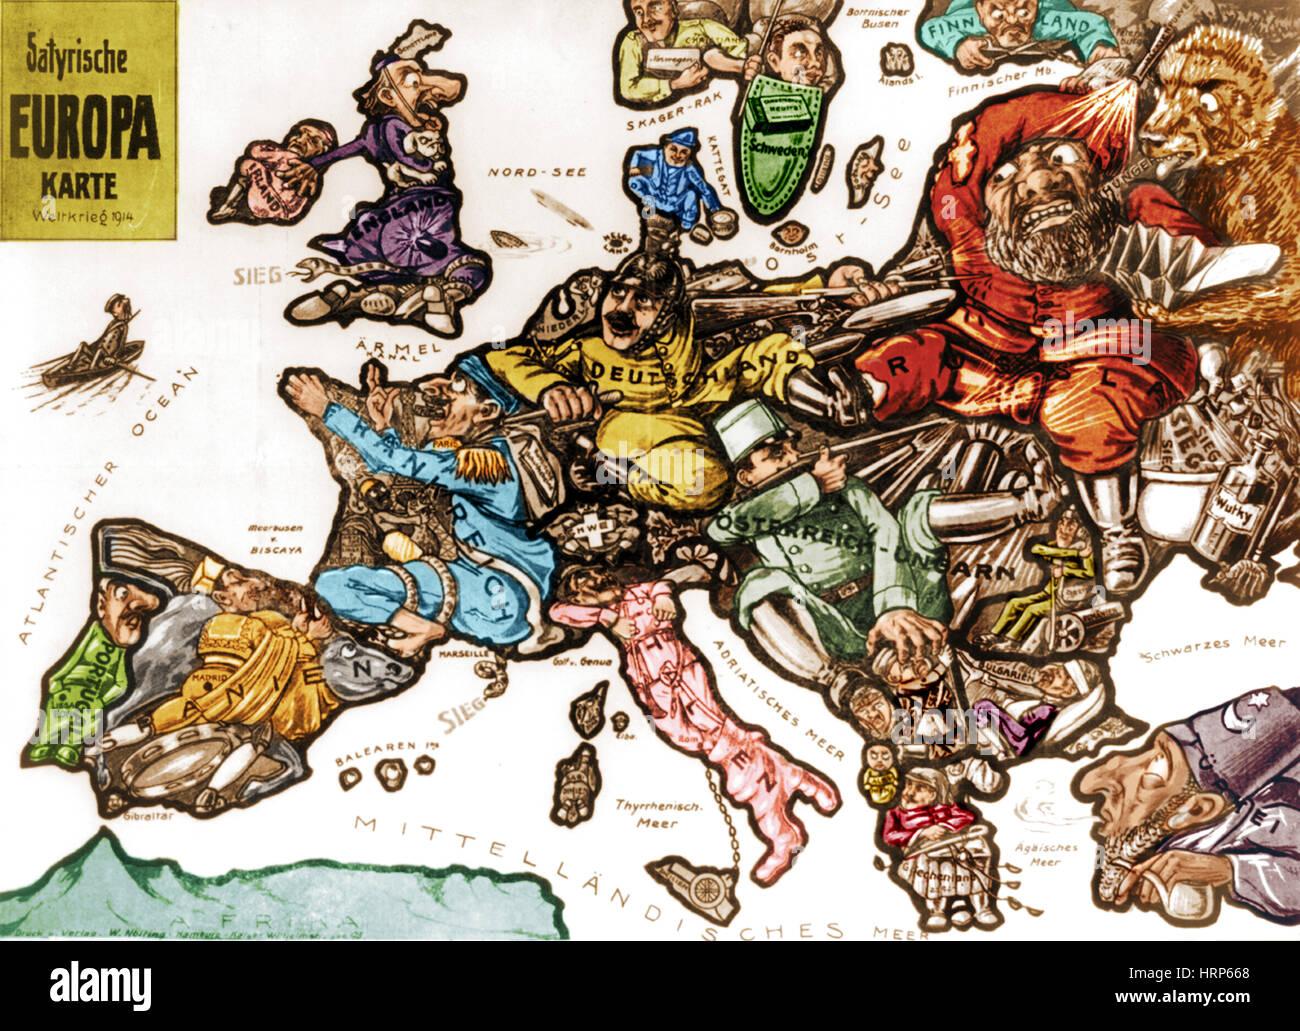 Wwi Satirical War Map Of Europe Stock Photo